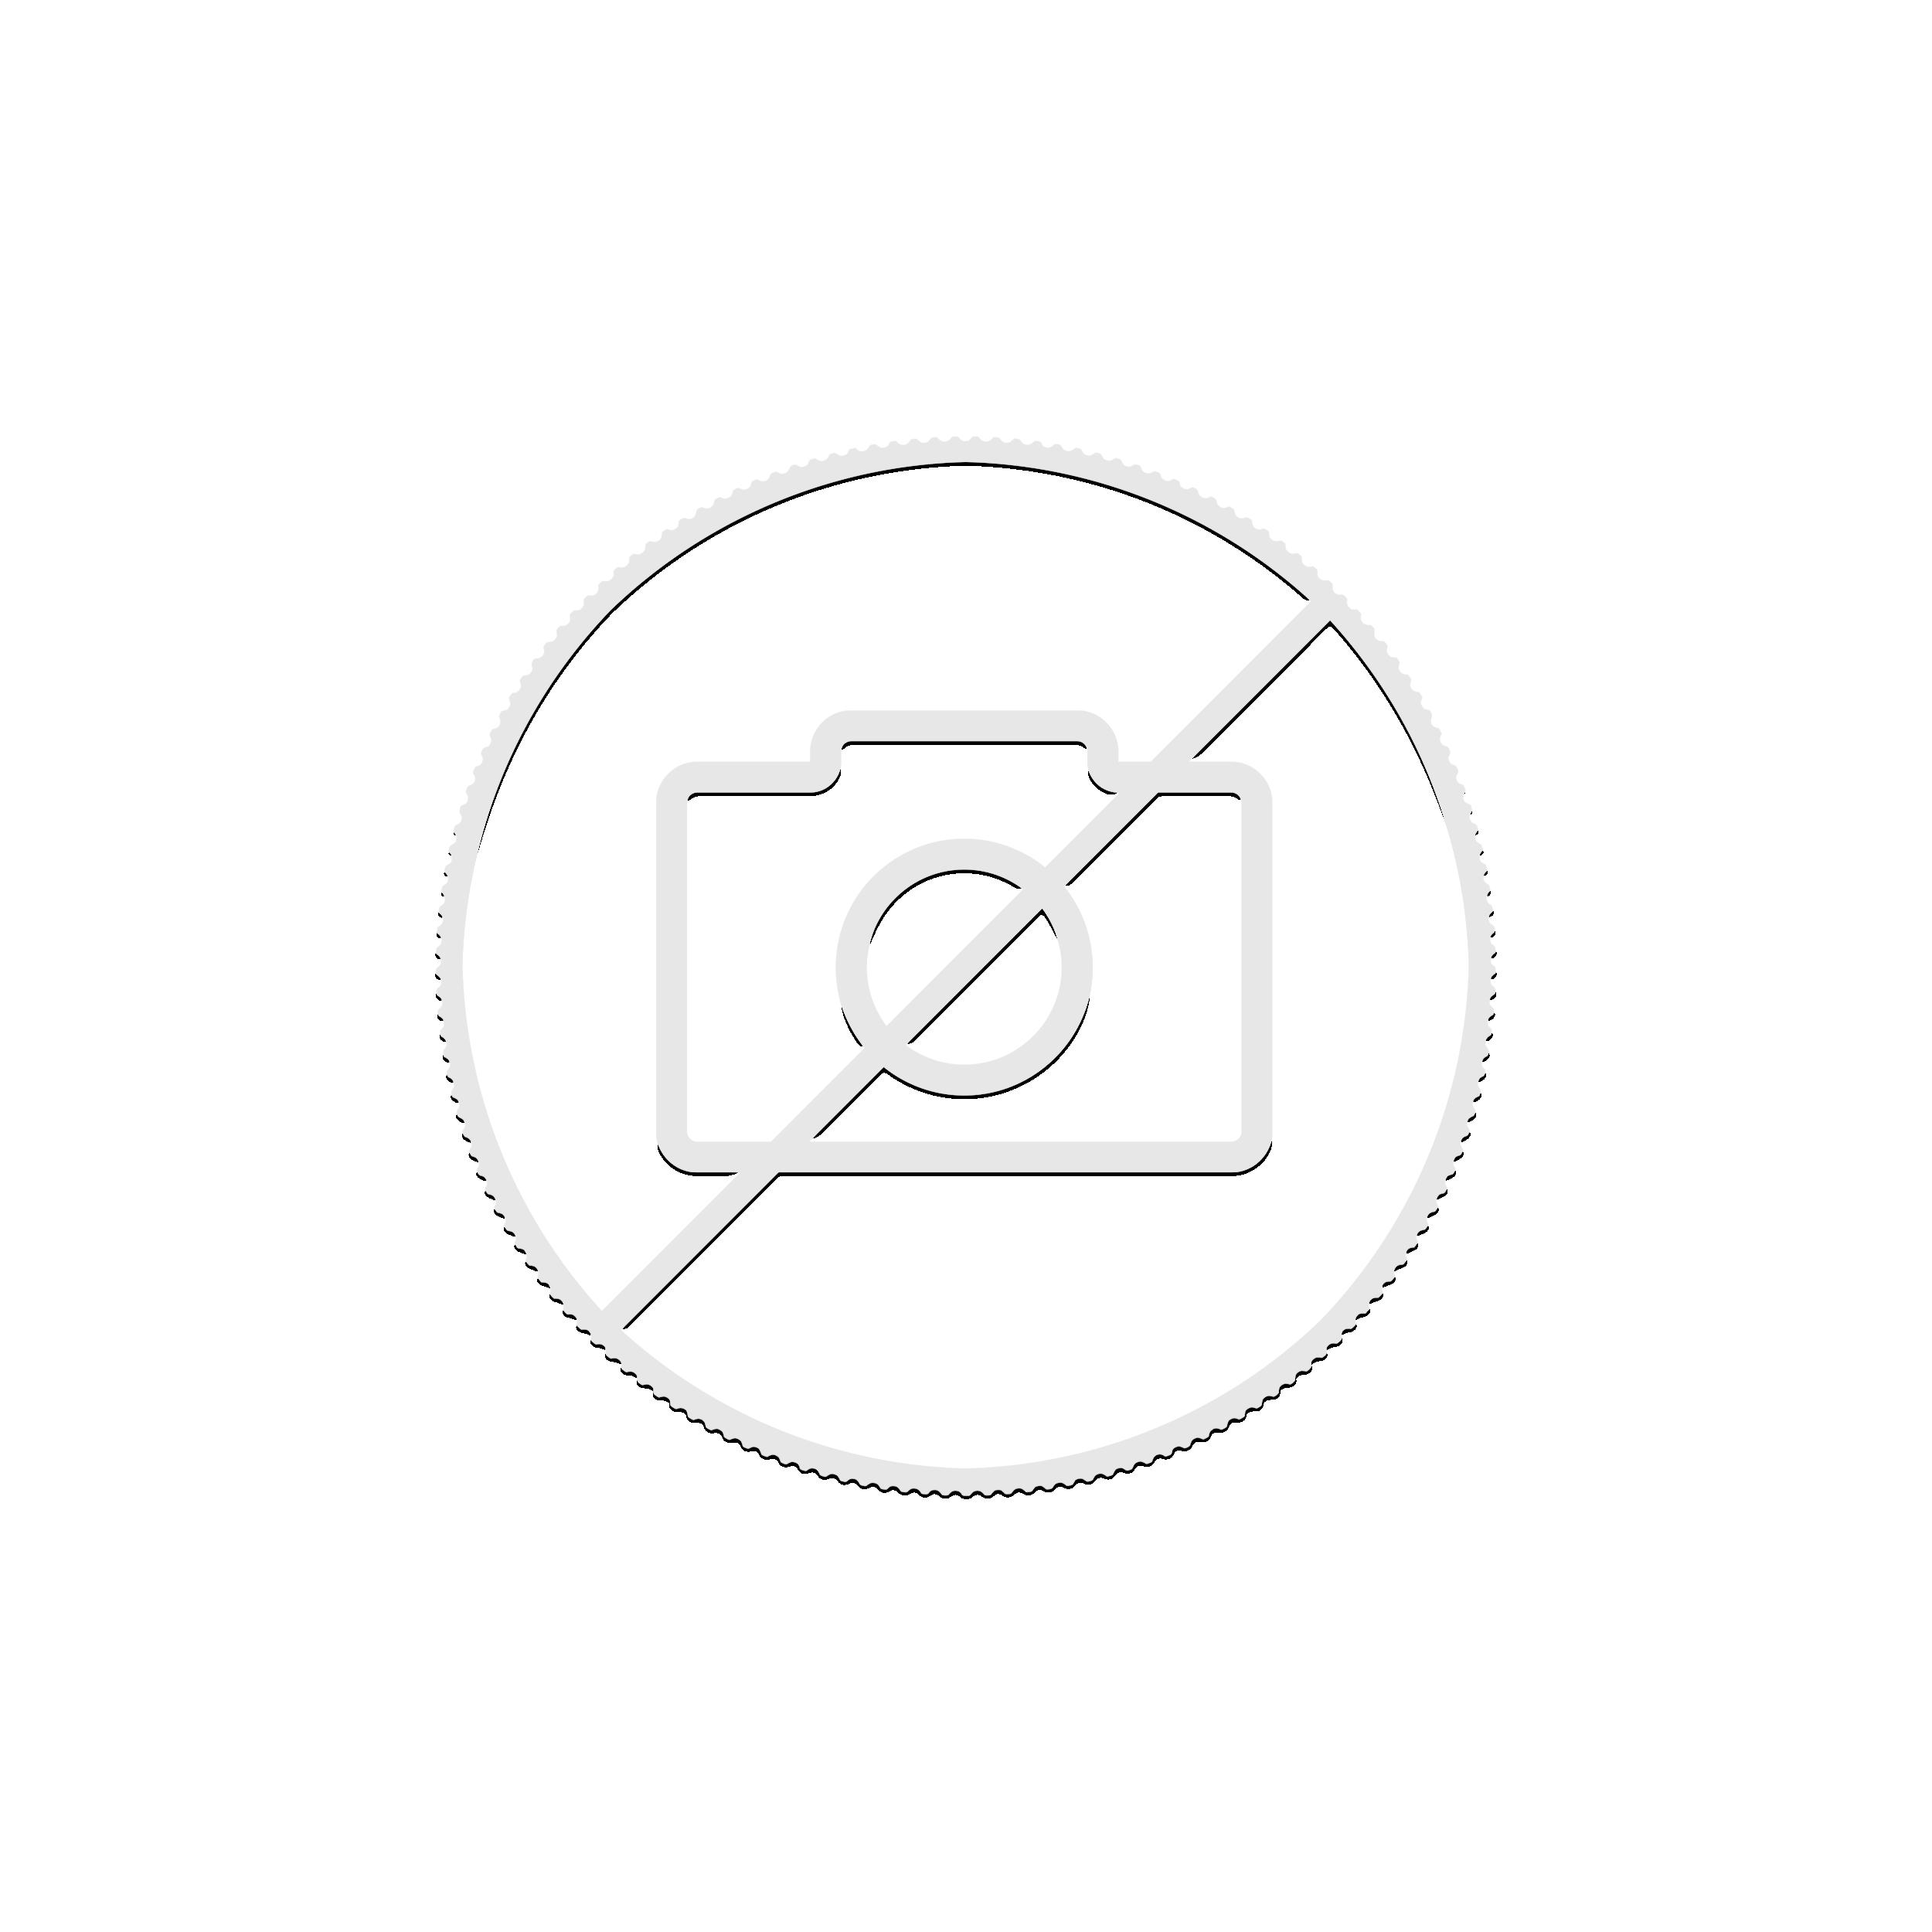 1 Troy ounce zilveren munt Disney Lunar Year of the Pig 2019